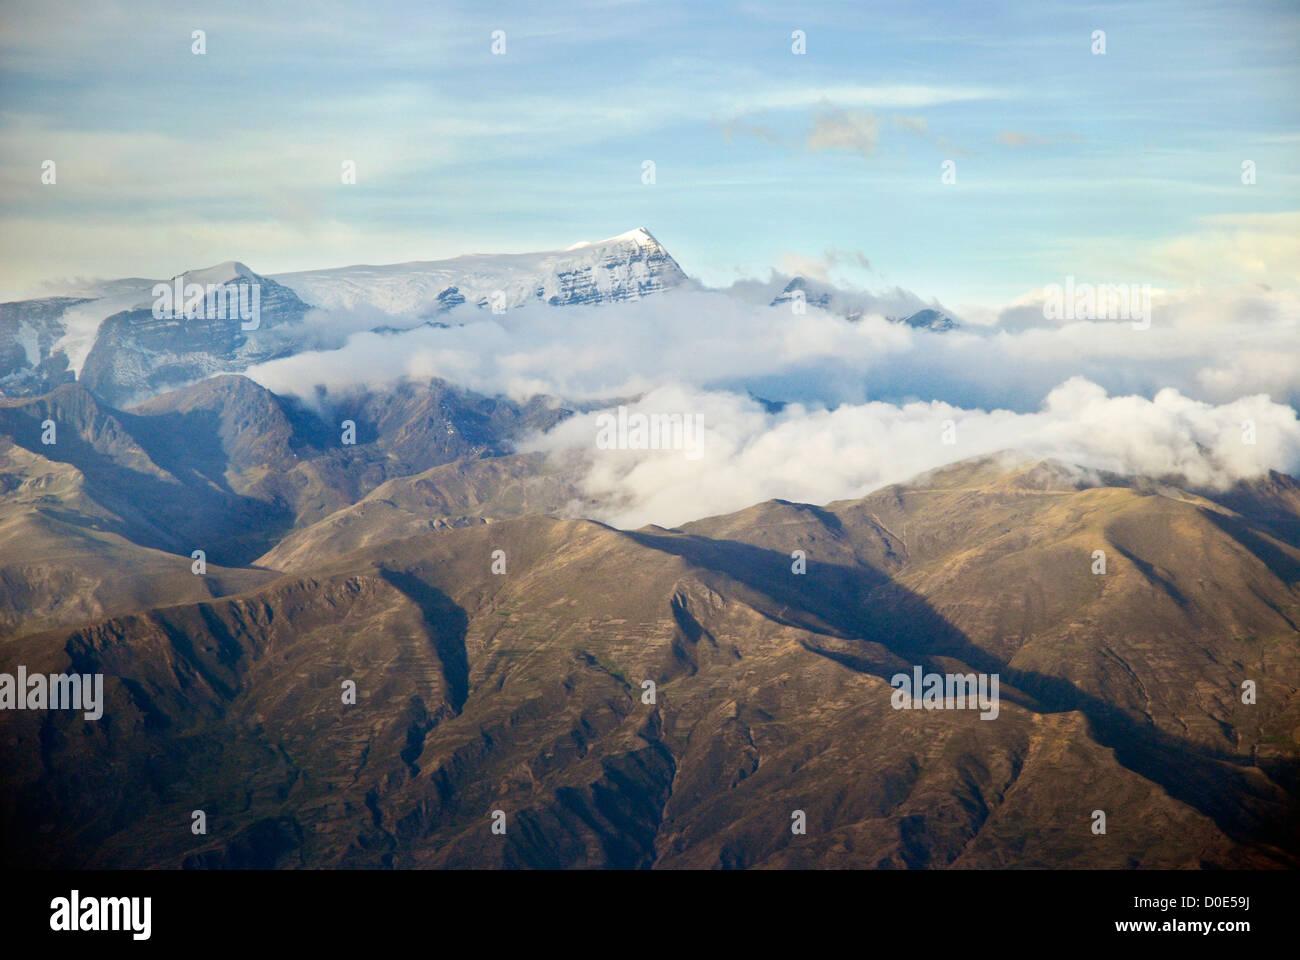 Aerial view of the mountain Mururata, Bolivia - Stock Image